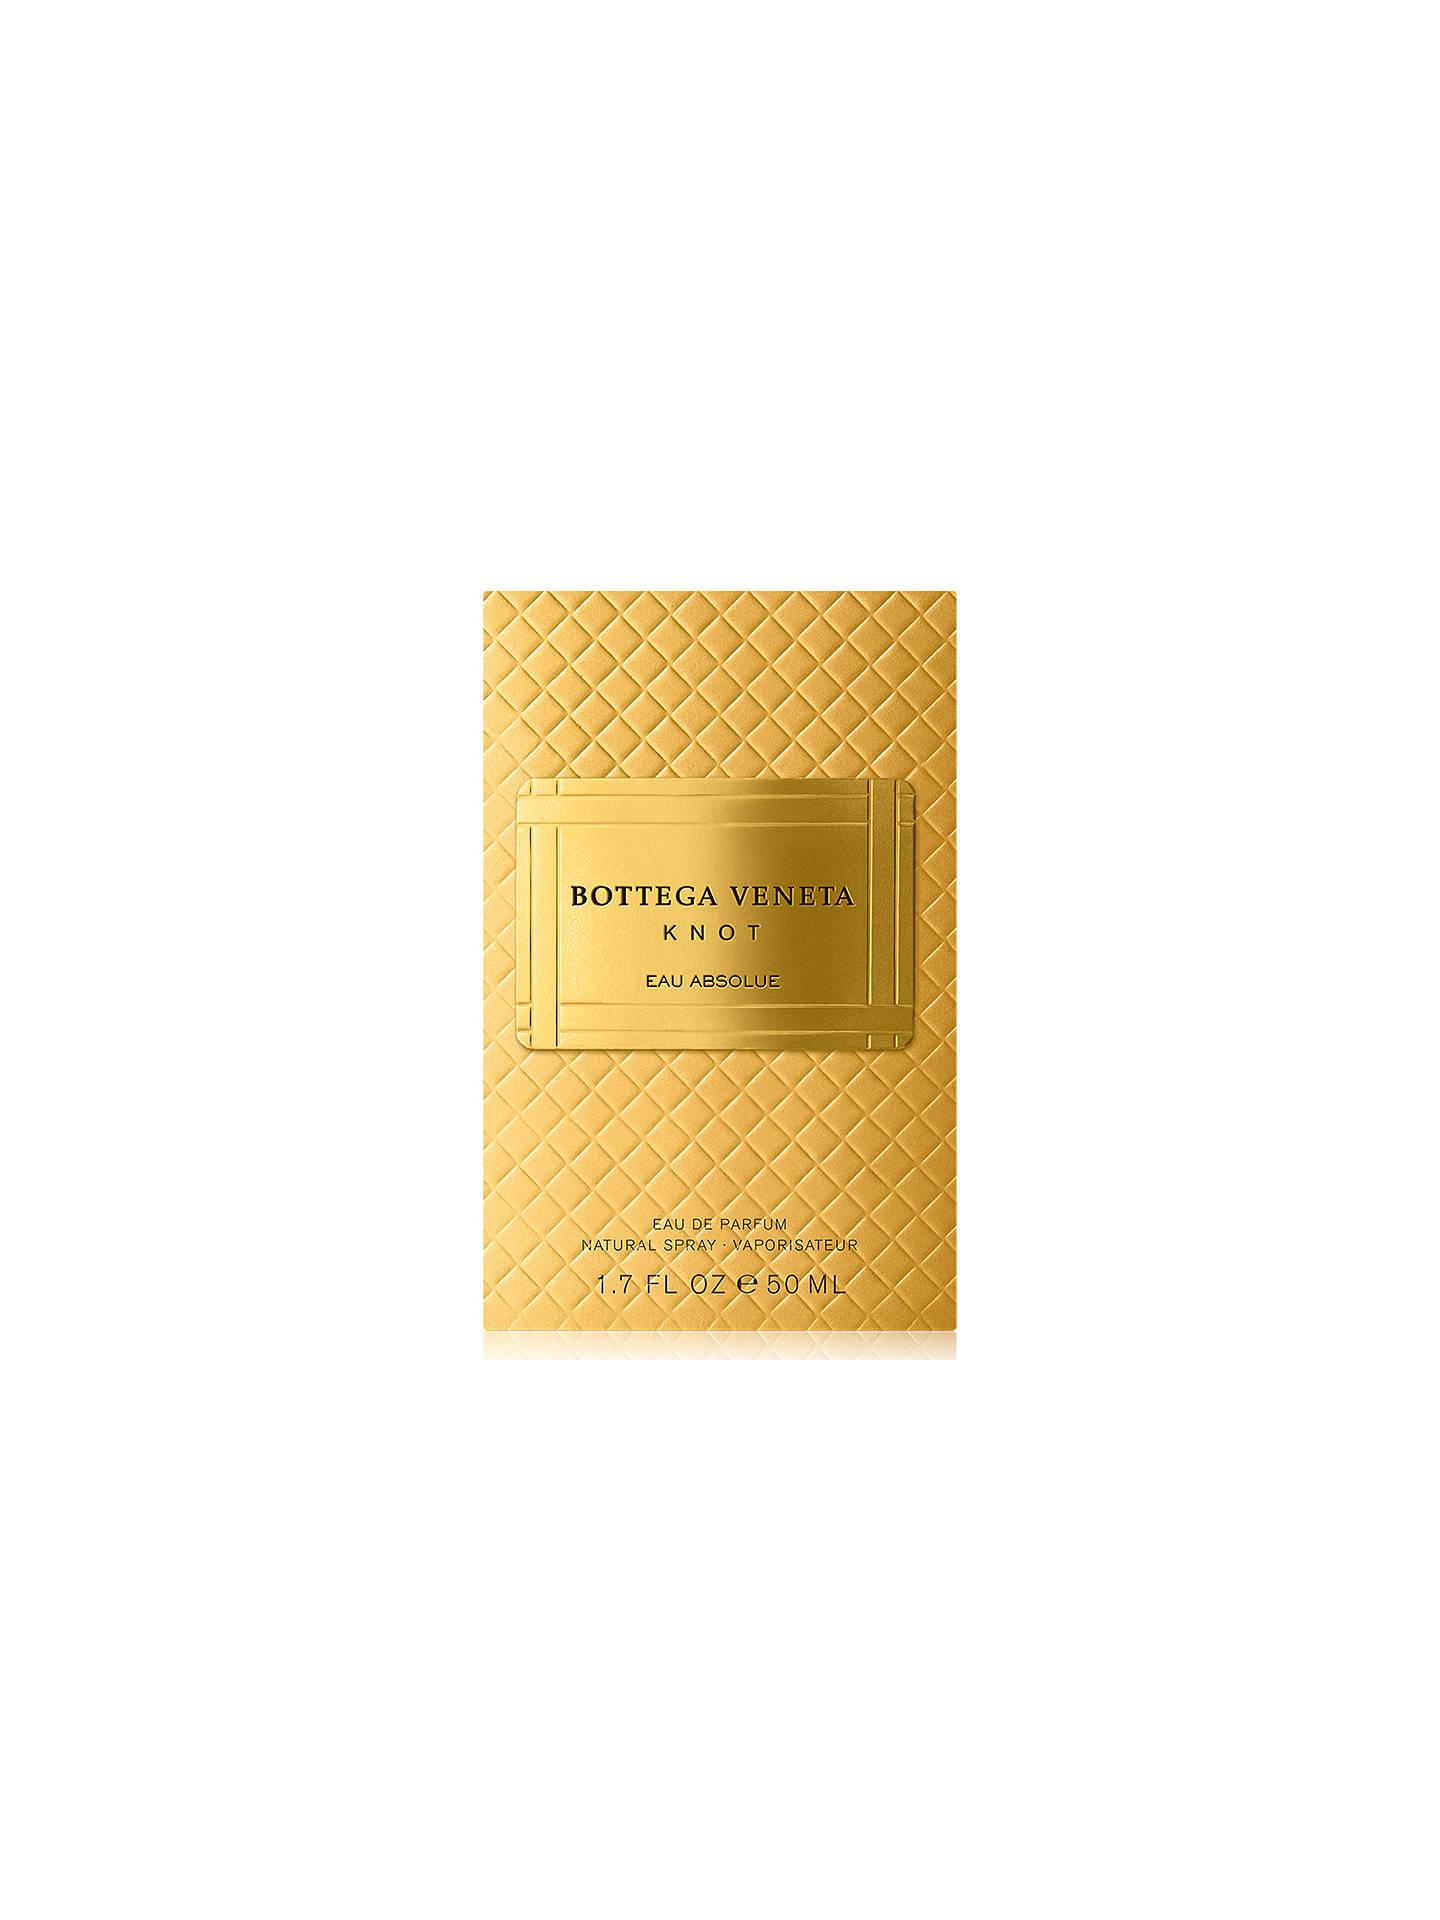 4cc948991b Bottega Veneta Knot Absolue Eau de Parfum at John Lewis   Partners